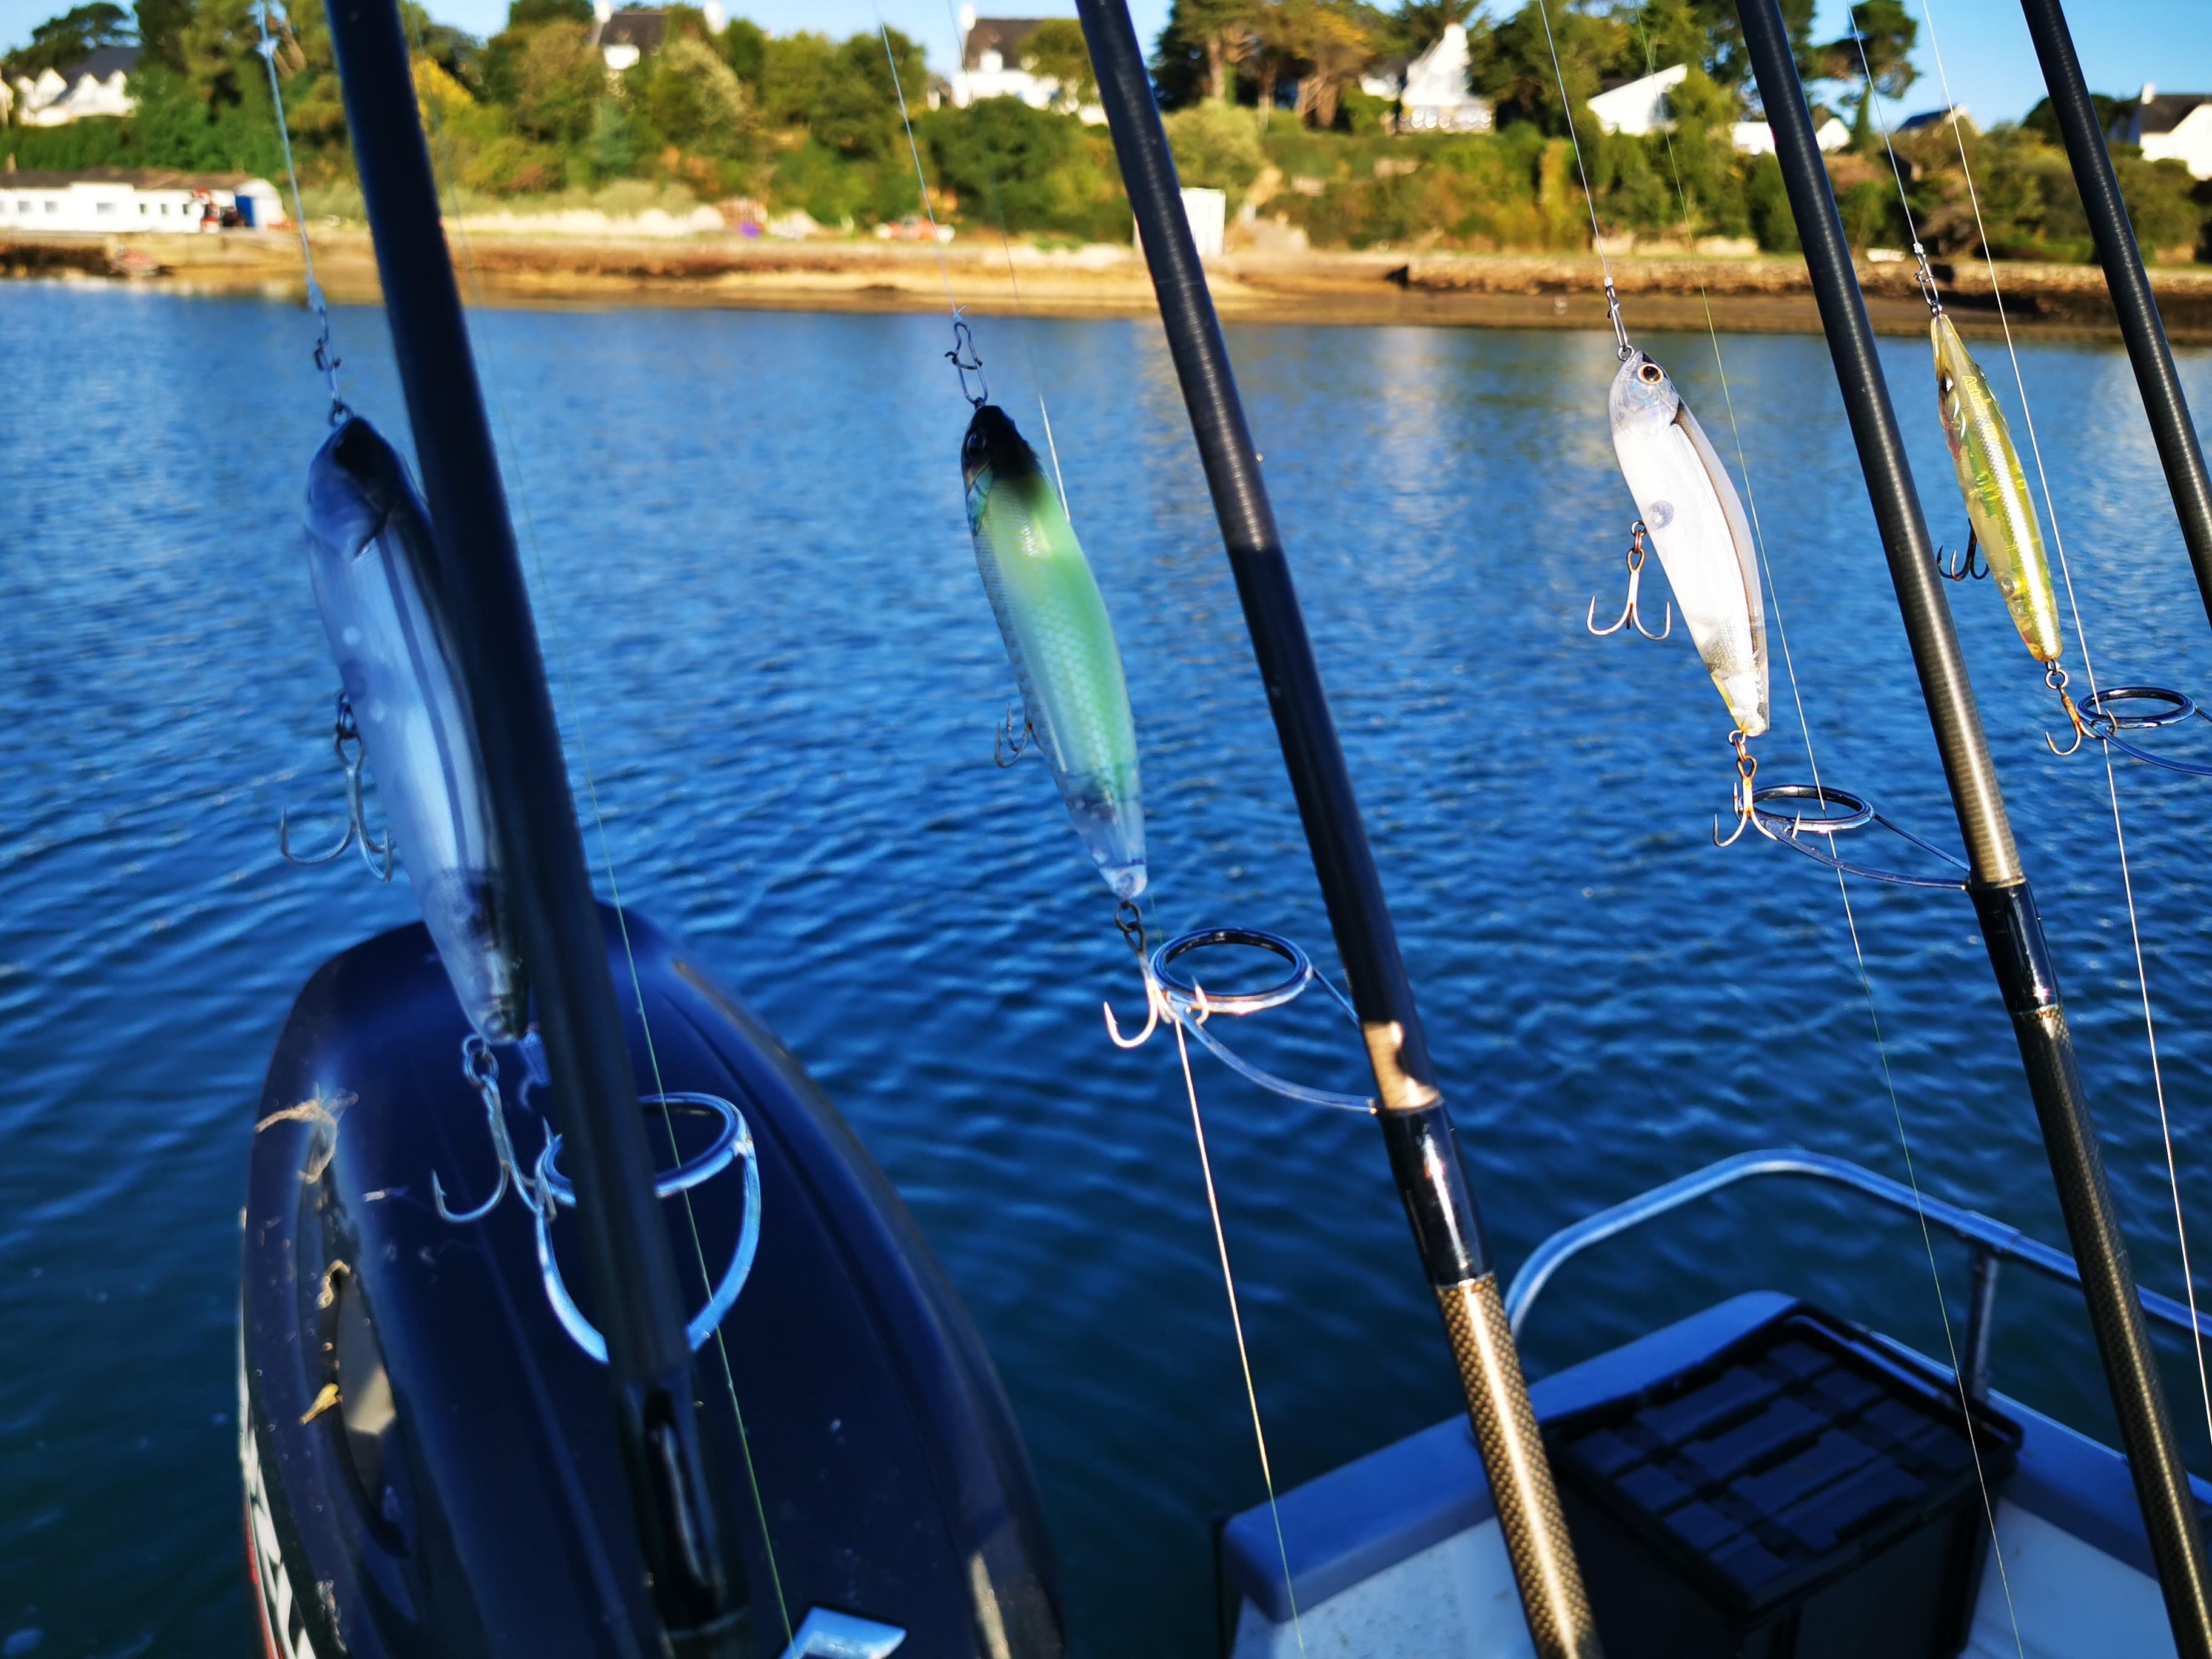 Pierre-Yves Perrodo guide de pêche golfe du morbihan, pêche au bar et dorade